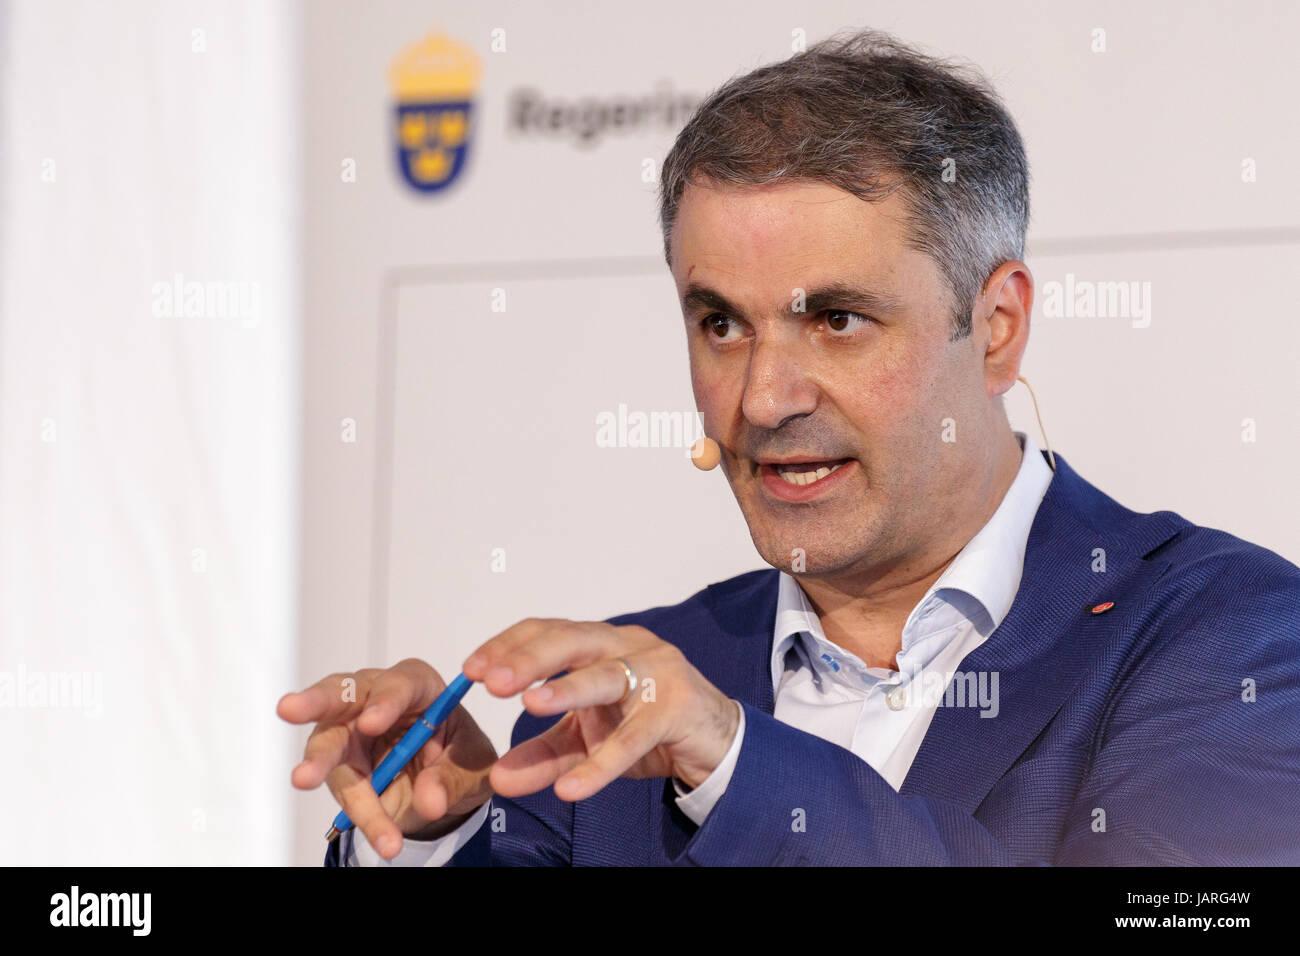 VISBY, SVERIGE - 5 JULI 2016 : Ibrahim Baylan Samordnings- och energiminister, vid Socialdemokraternas presskonferens - Stock Image